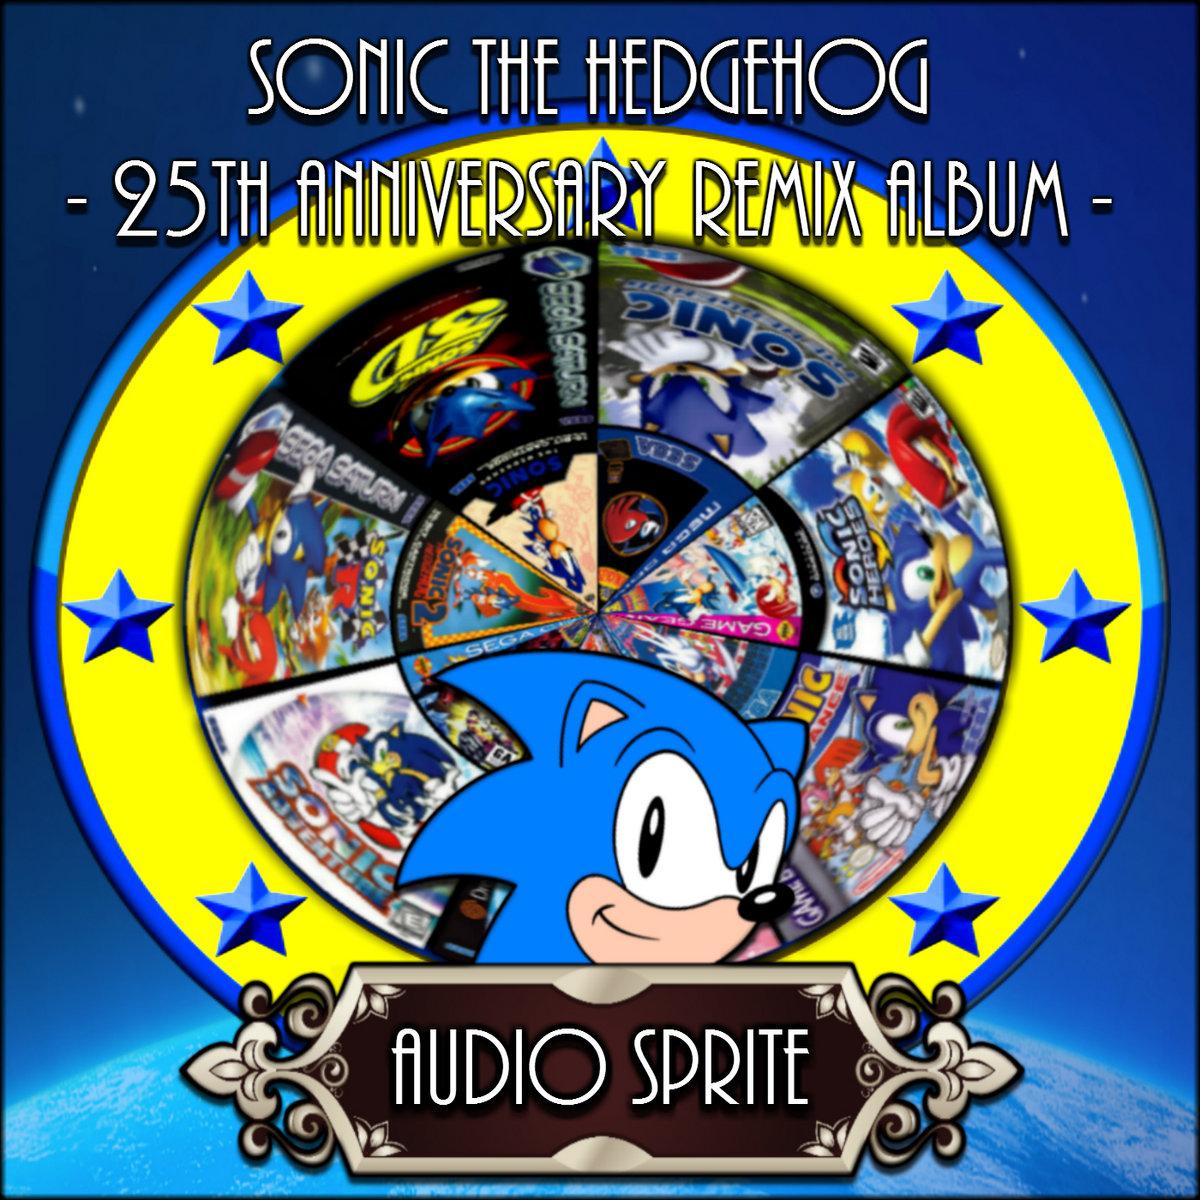 Sonic The Hedgehog 25th Anniversary Remix Album | Audio Sprite